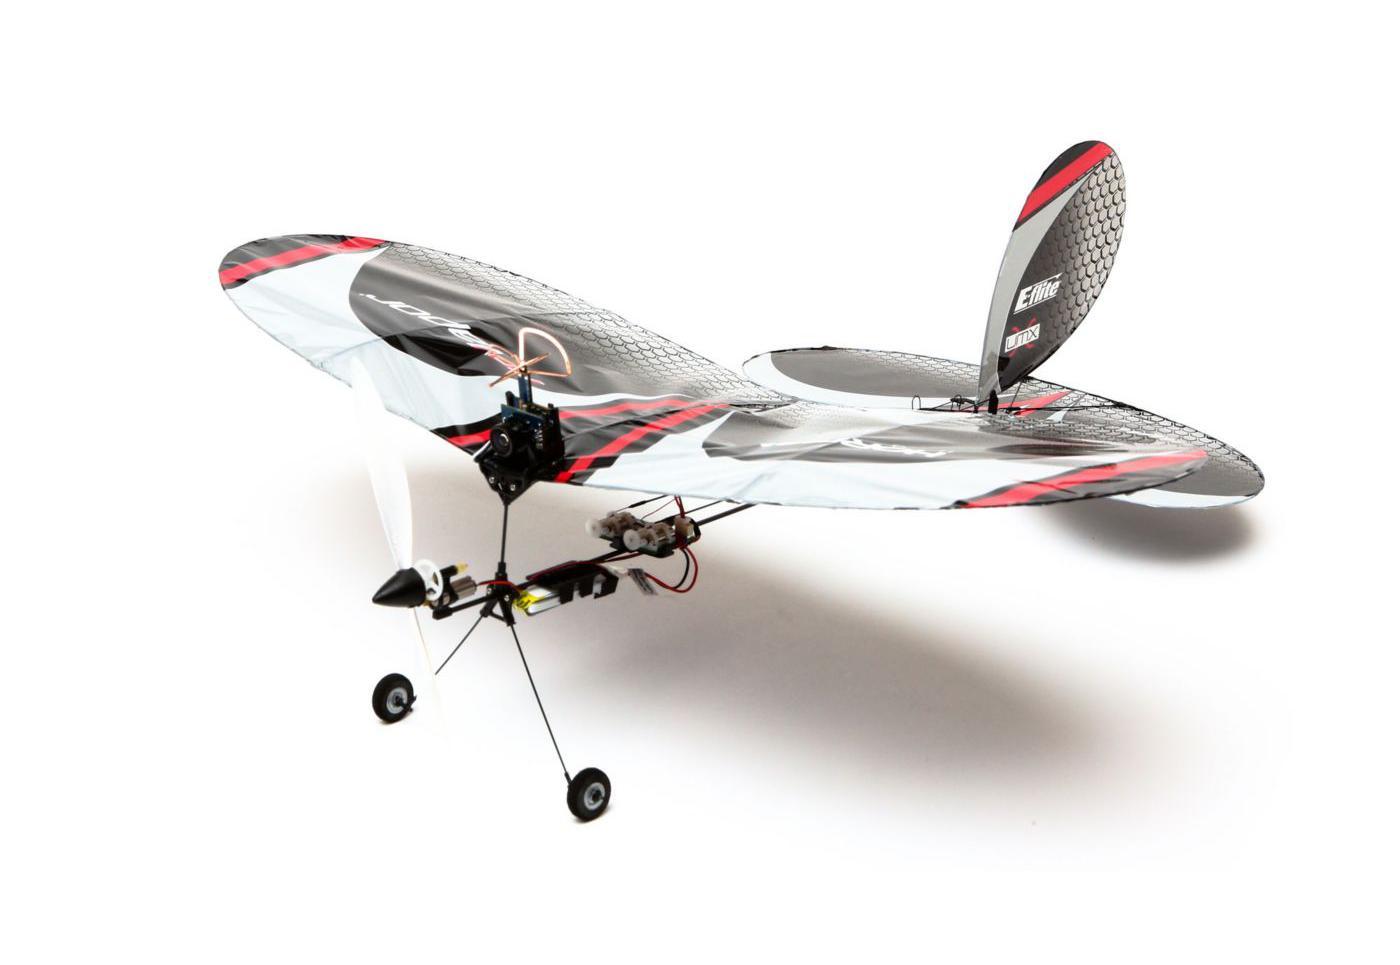 E-flite Радиоуправляемый Самолет с FPV - Vapor RTF W/ Headset